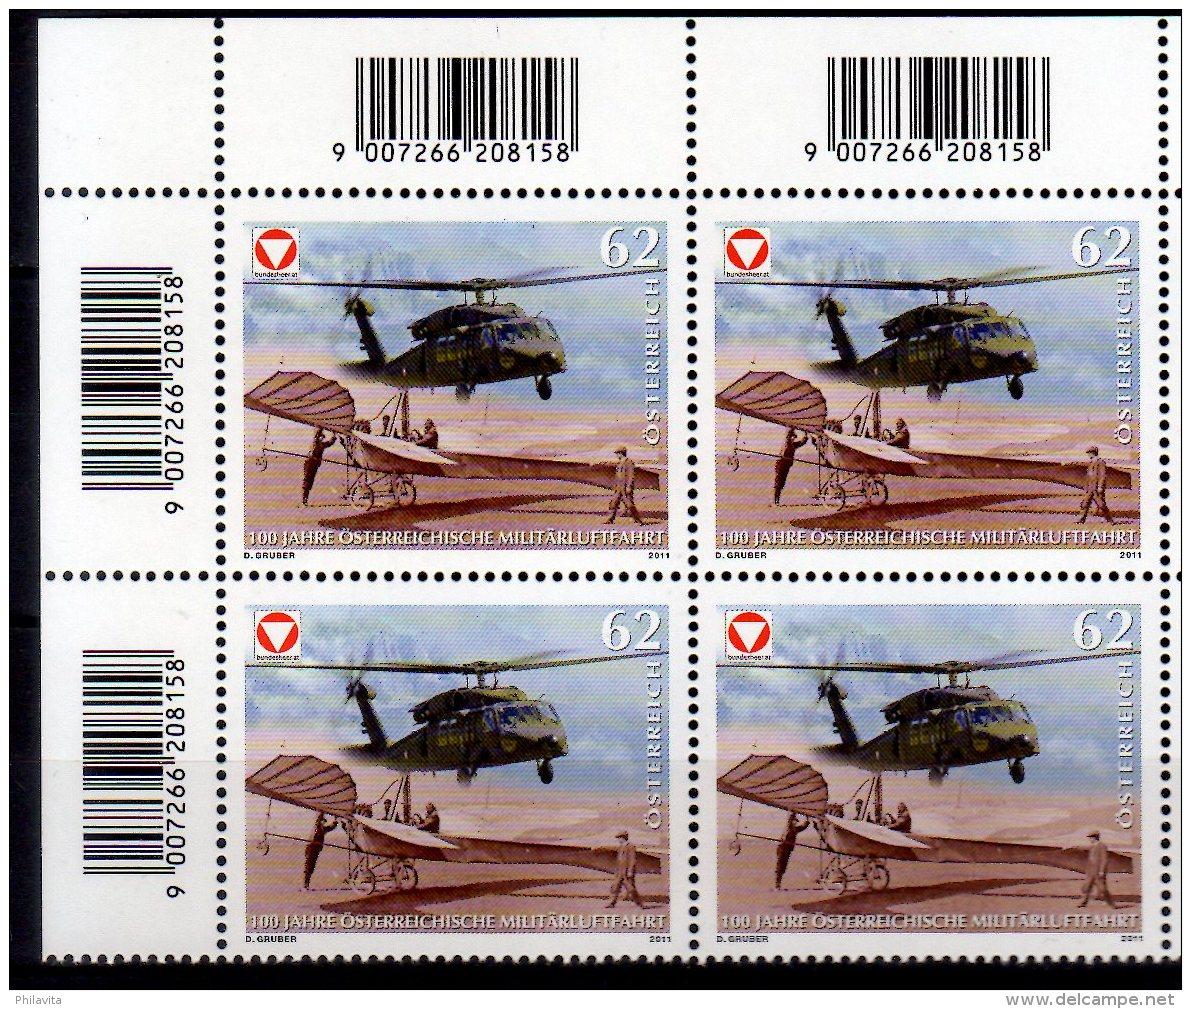 2011 Austria 100 Jahre Öster. Militärluftfahrt /100 Years Of Military Flight In Austria Corner Block 4 MNH ** MiNr. 2943 - 1945-.... 2nd Republic